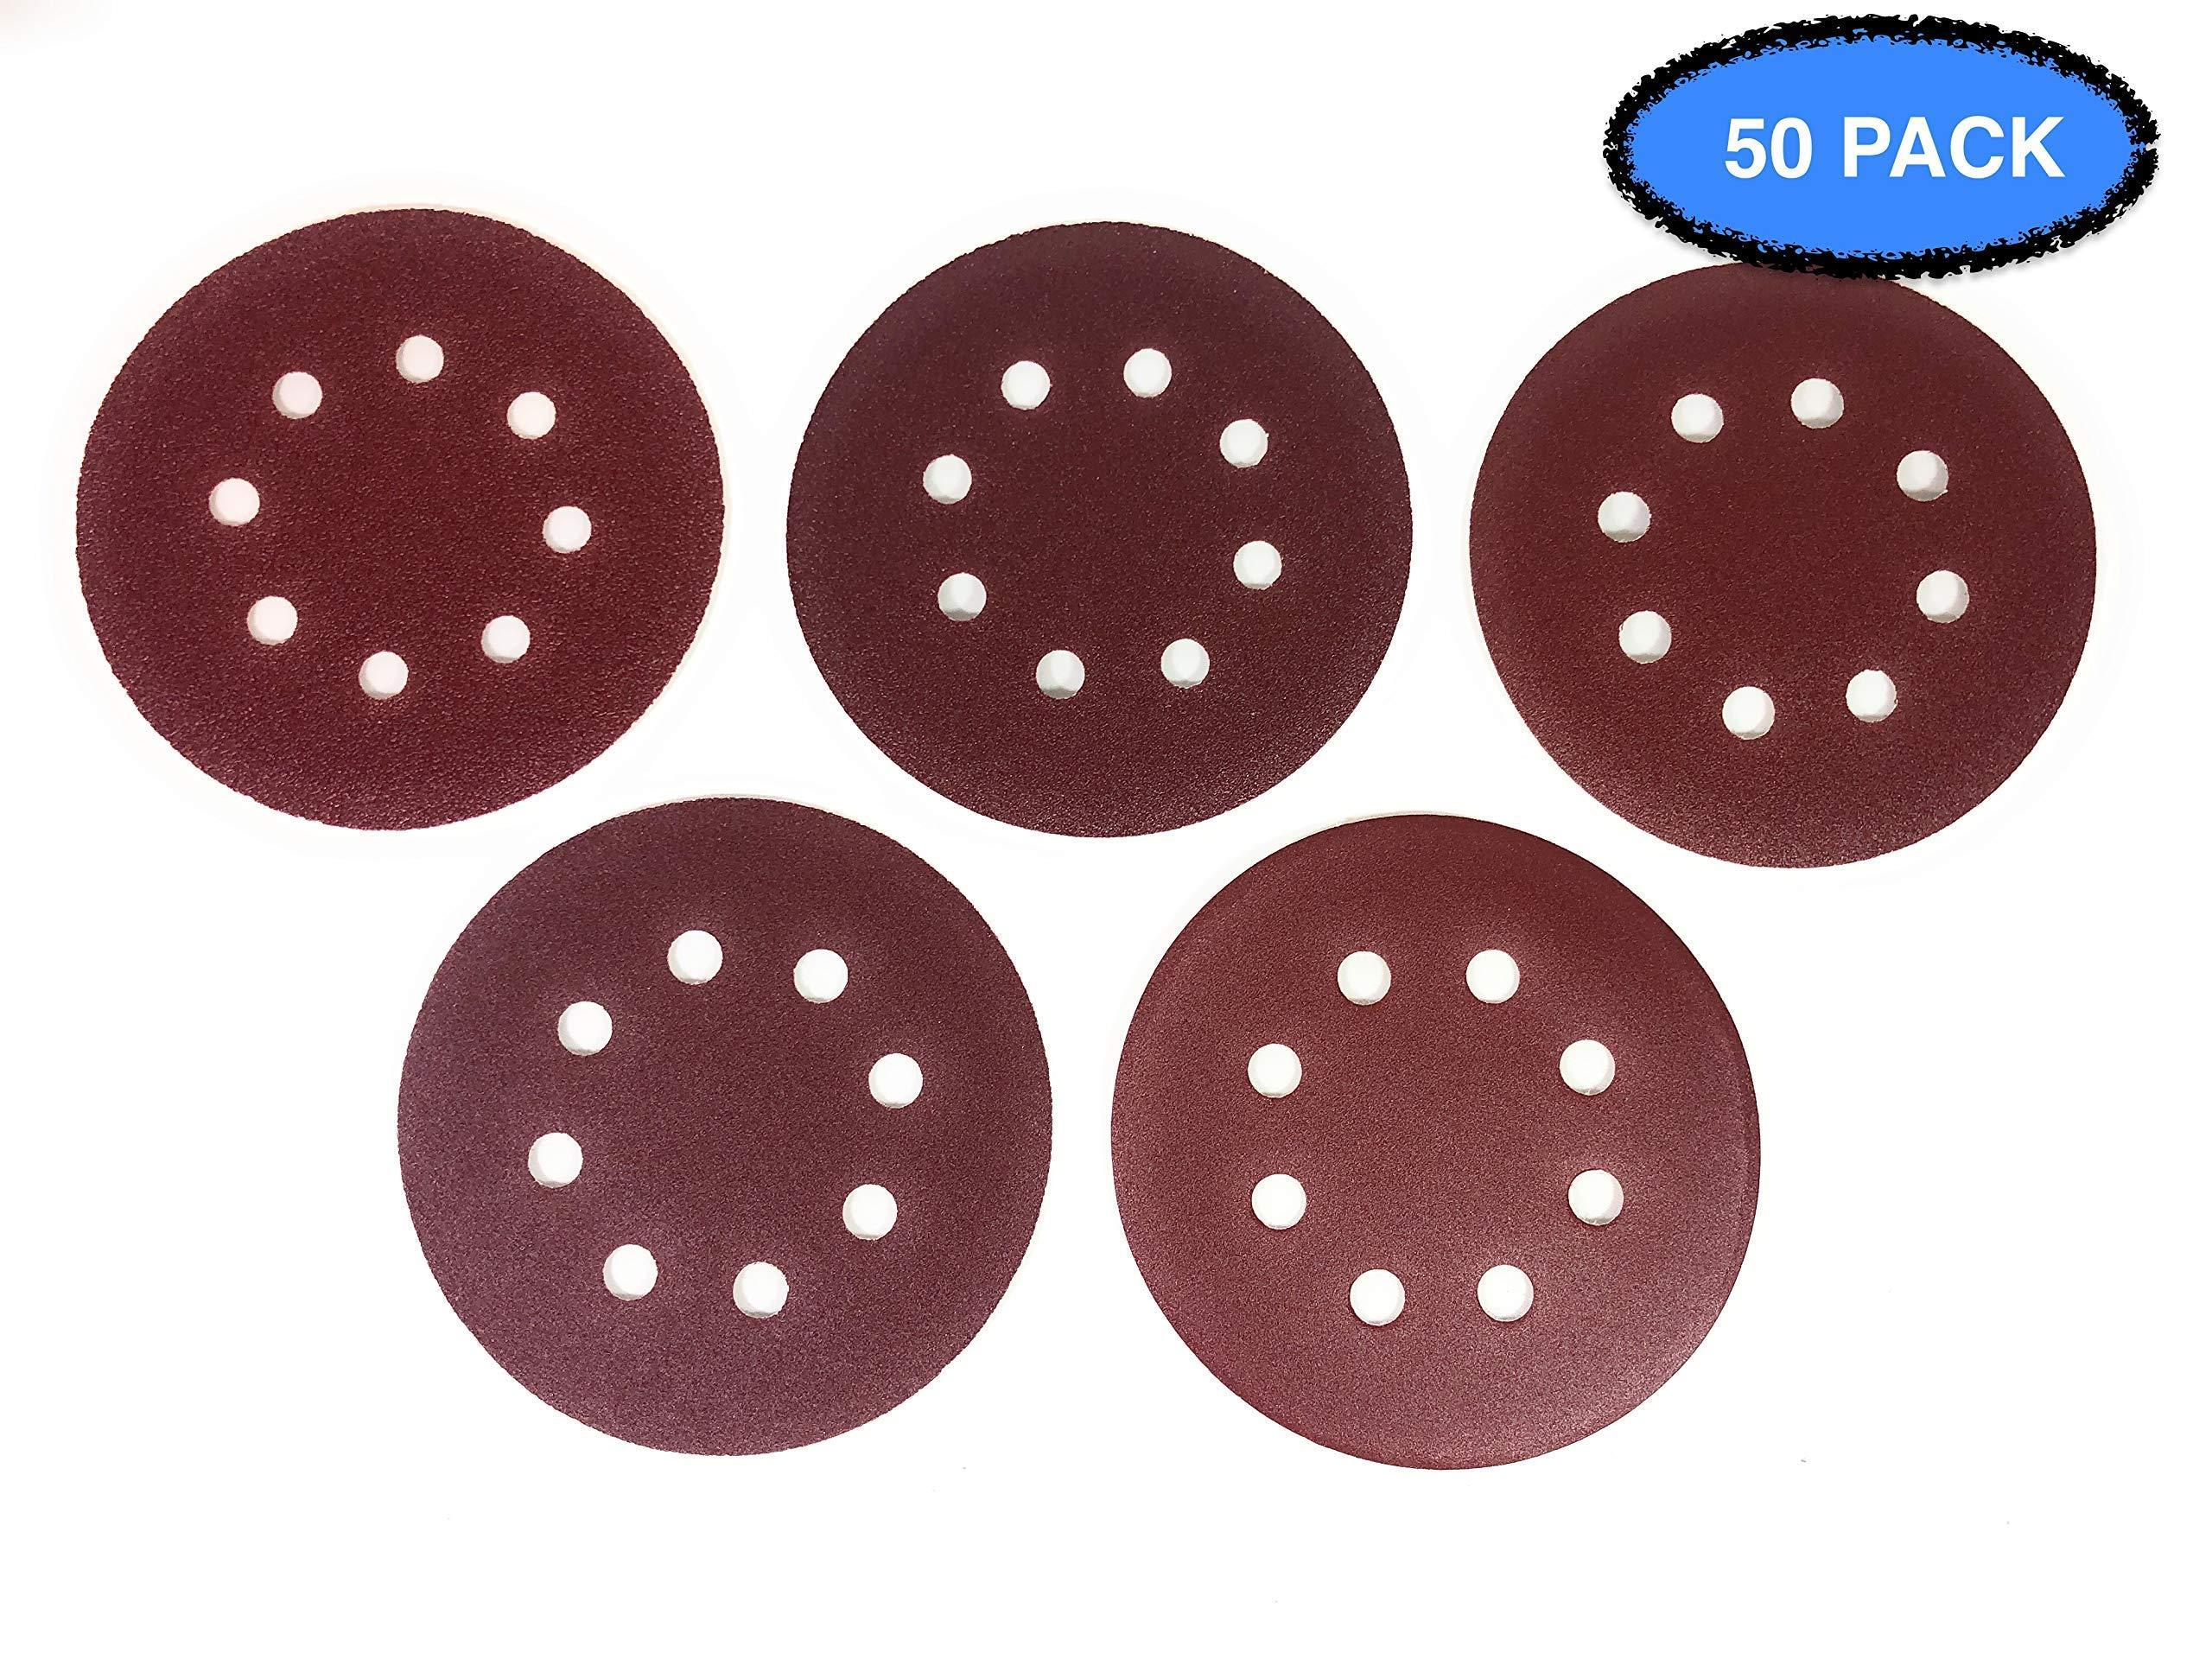 5 Inch 8 Hole Aluminum Oxide Premium Sanding Discs by Hitek 50PCS Assorted #60/120/150/220/320 Grits for Random Orbit Sanders